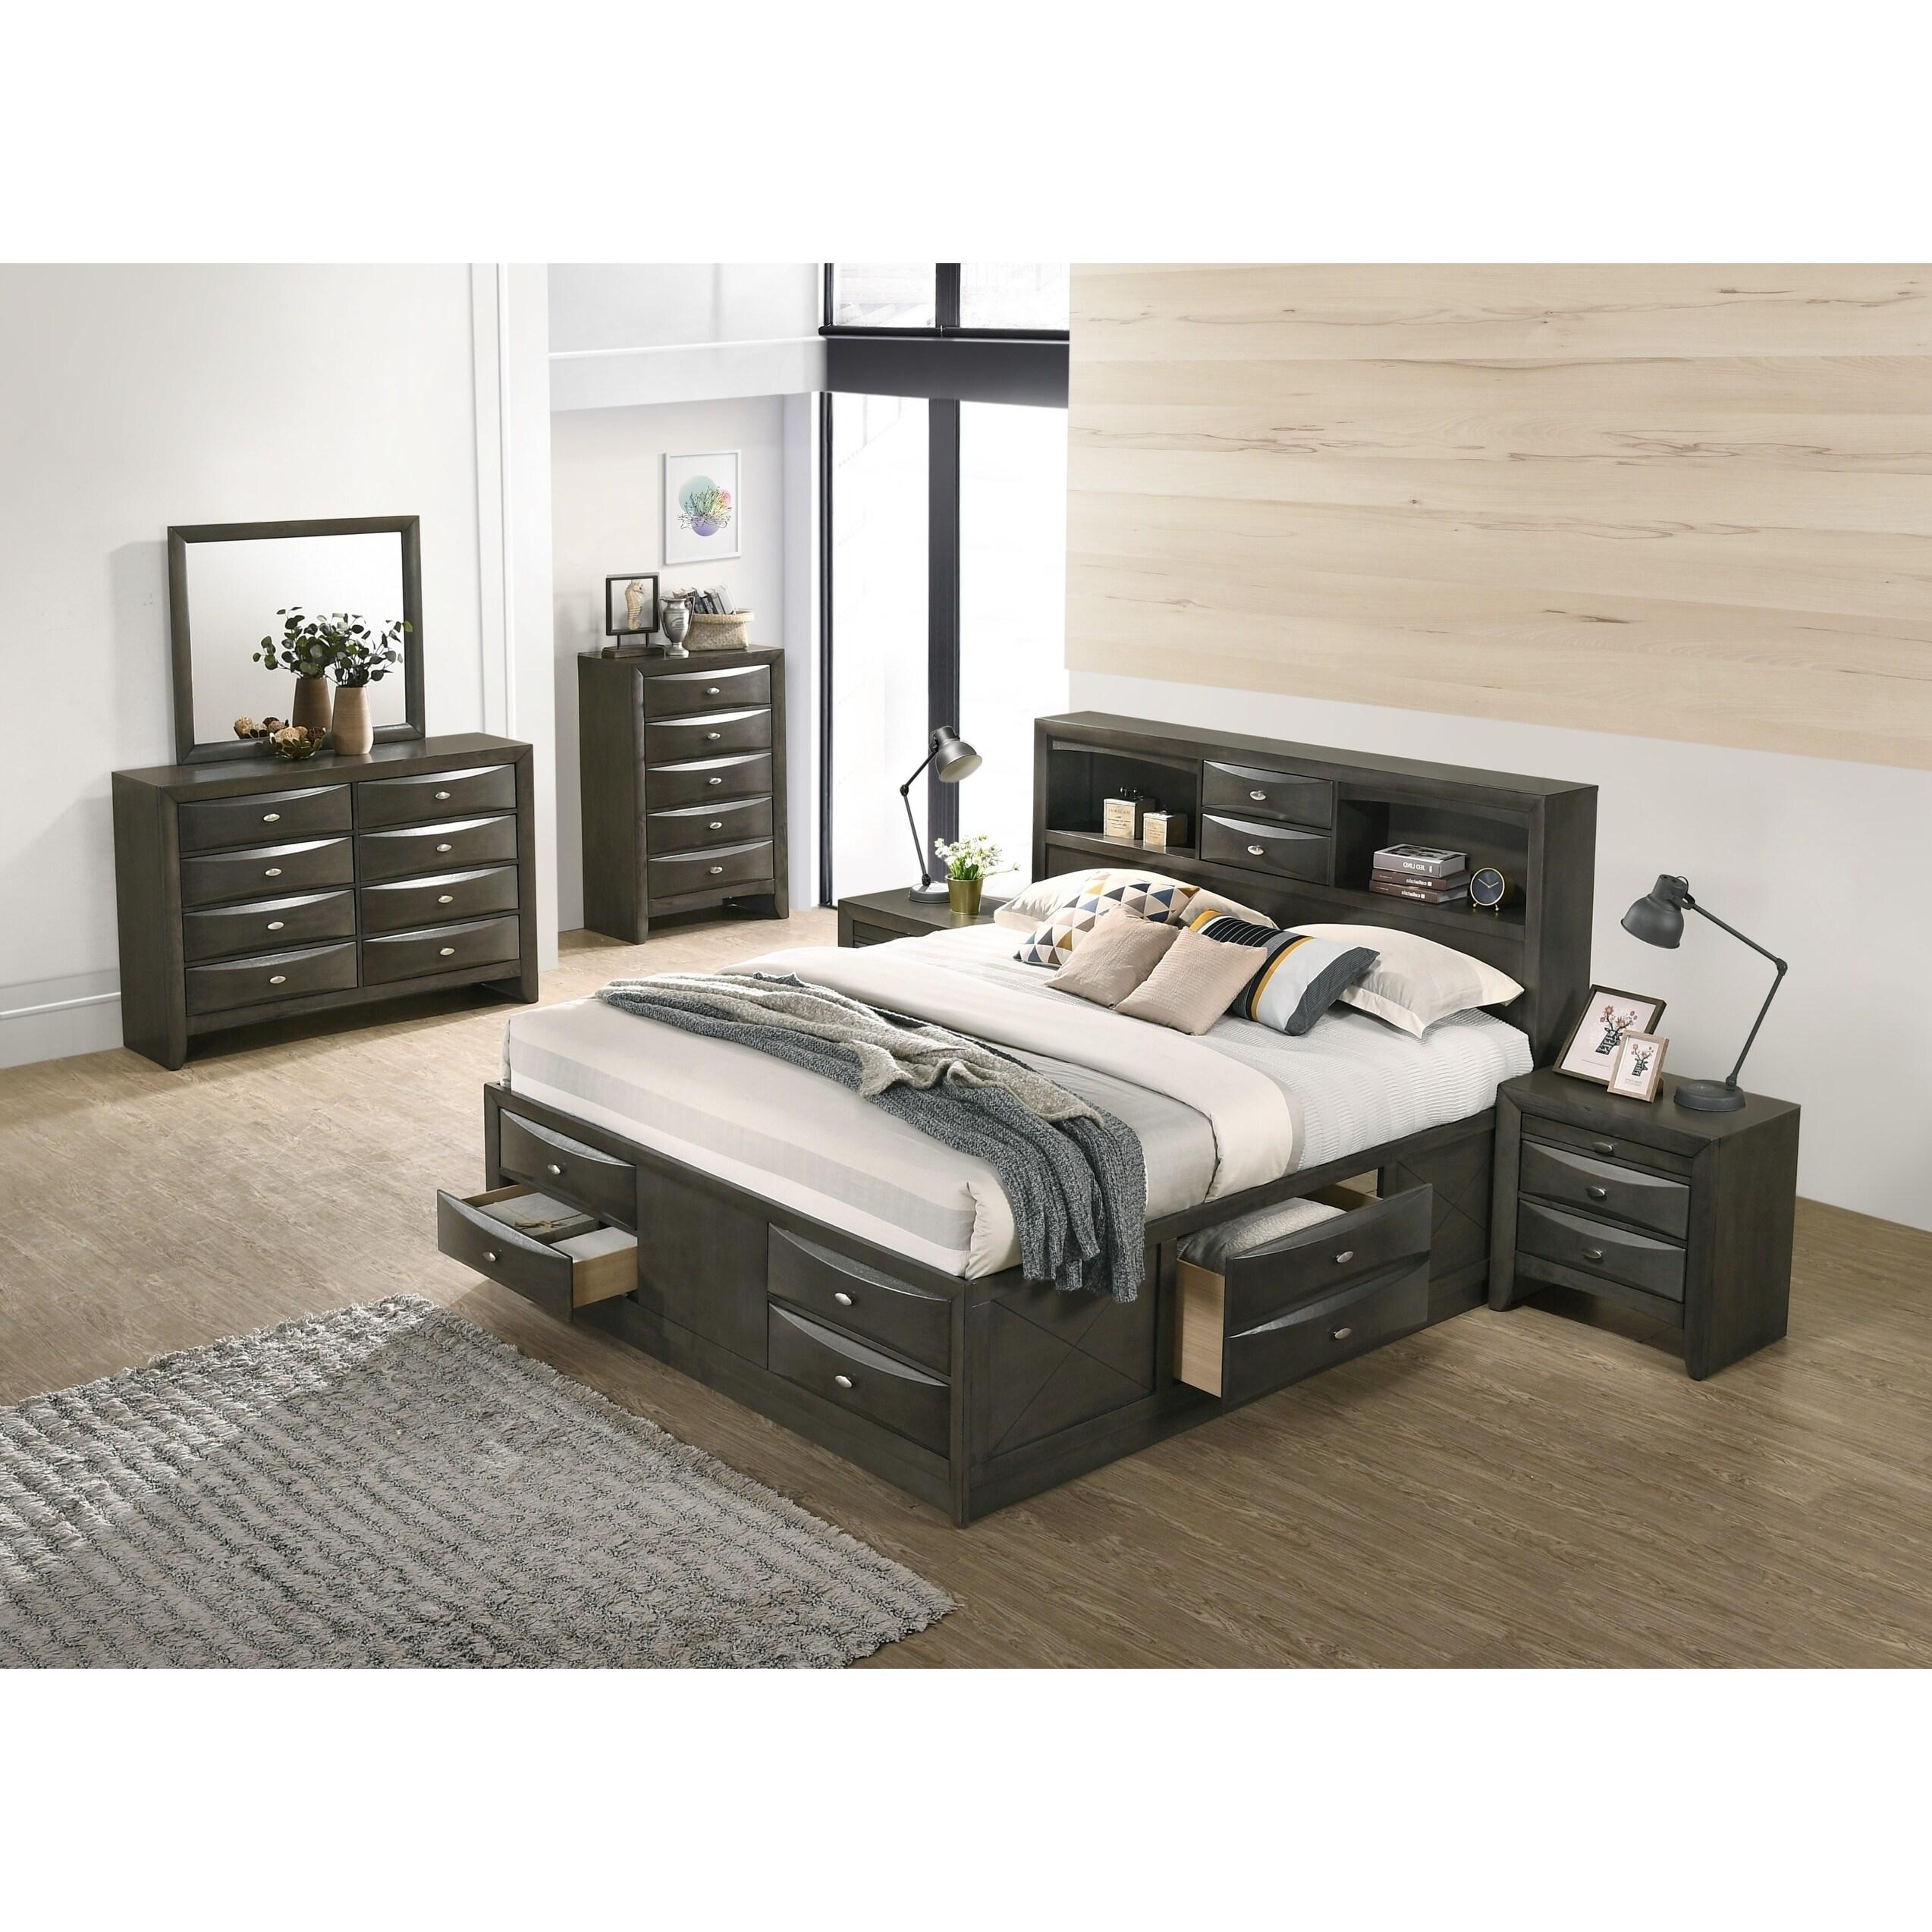 Leslie Gray Finish Bed Set